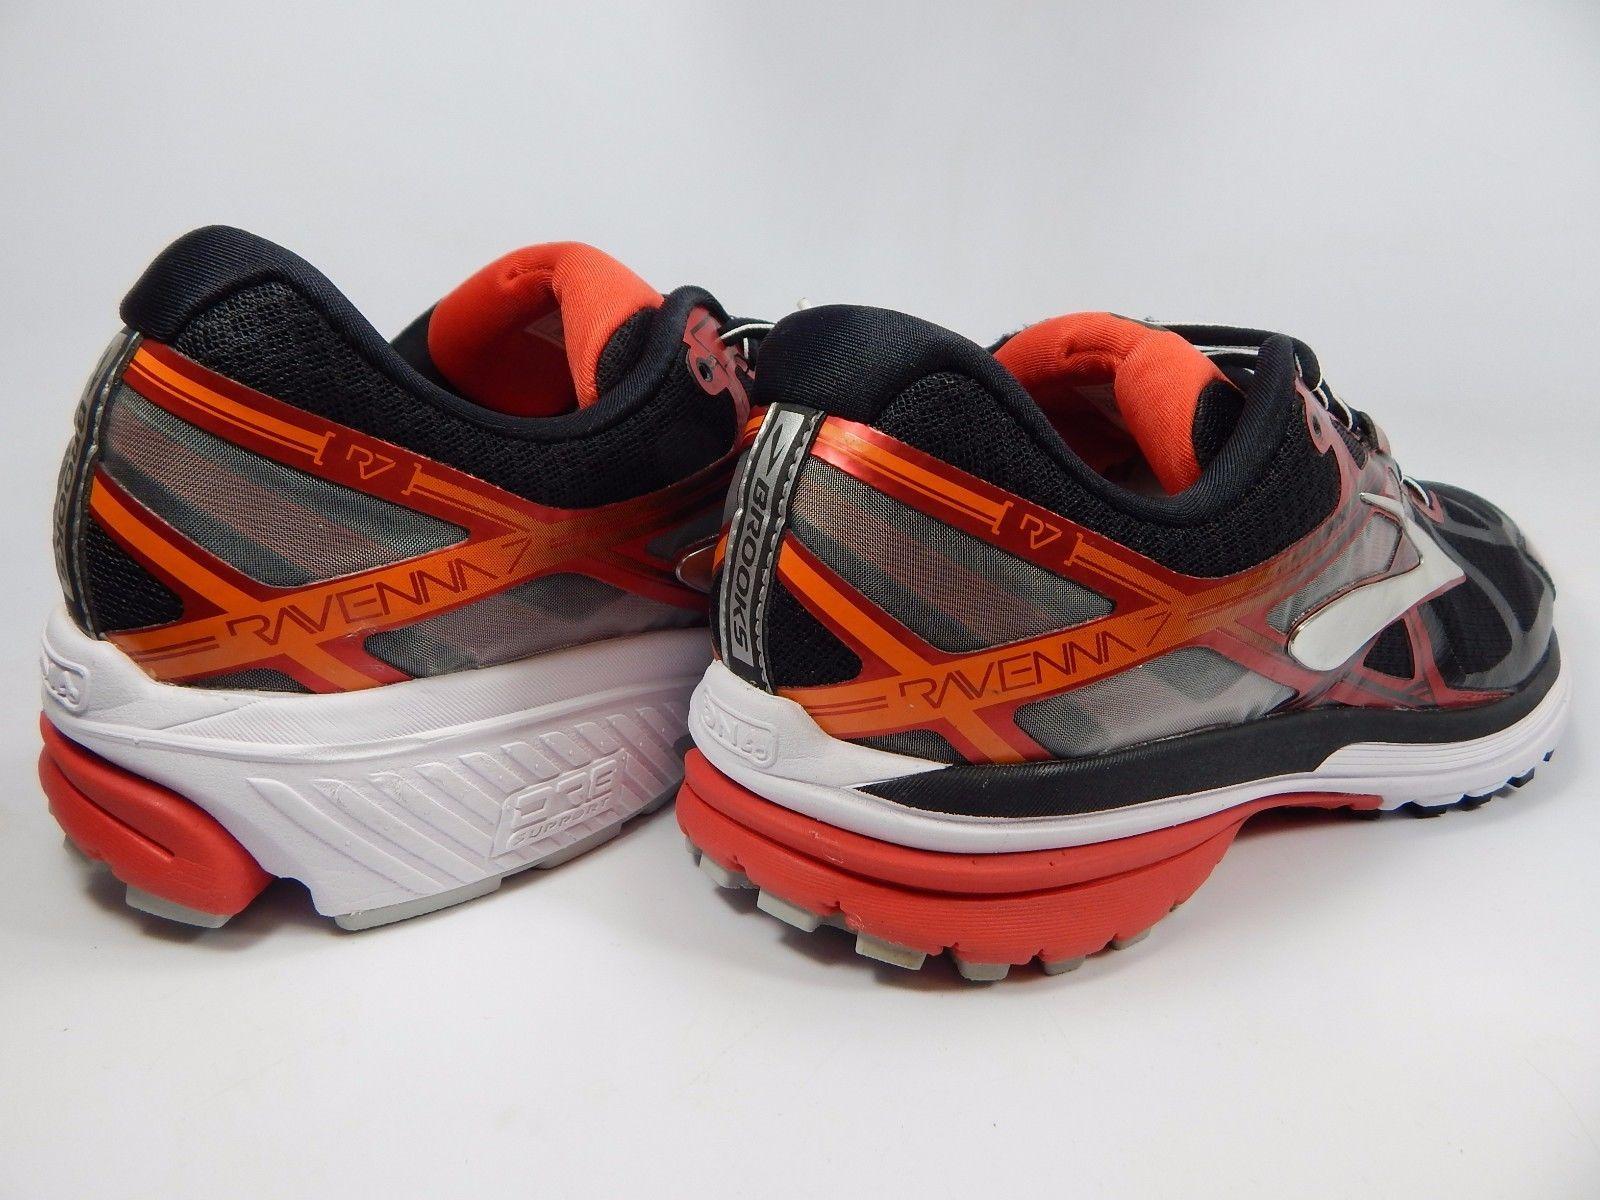 Brooks Ravenna 7 Men's Running Shoes Size US 12 M (D) EU 46 Black 1102171D062